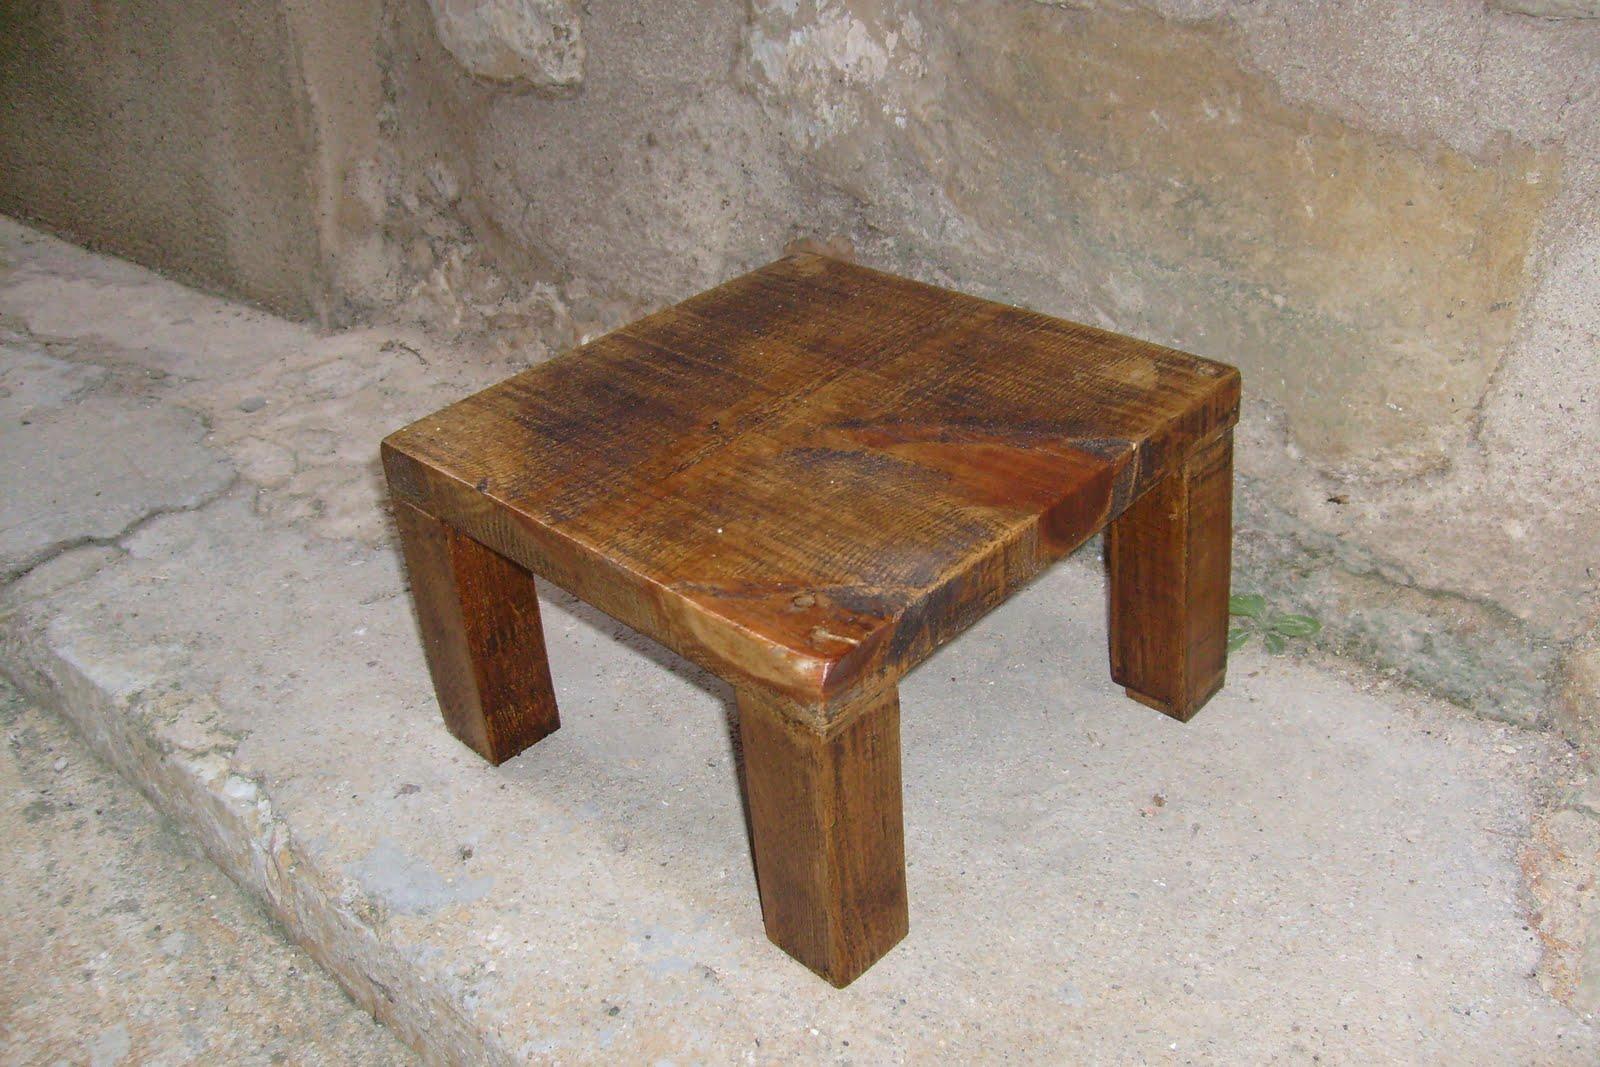 Muebles de antes mesa chill out y sus hijos taburetes - Muebles chill out baratos ...